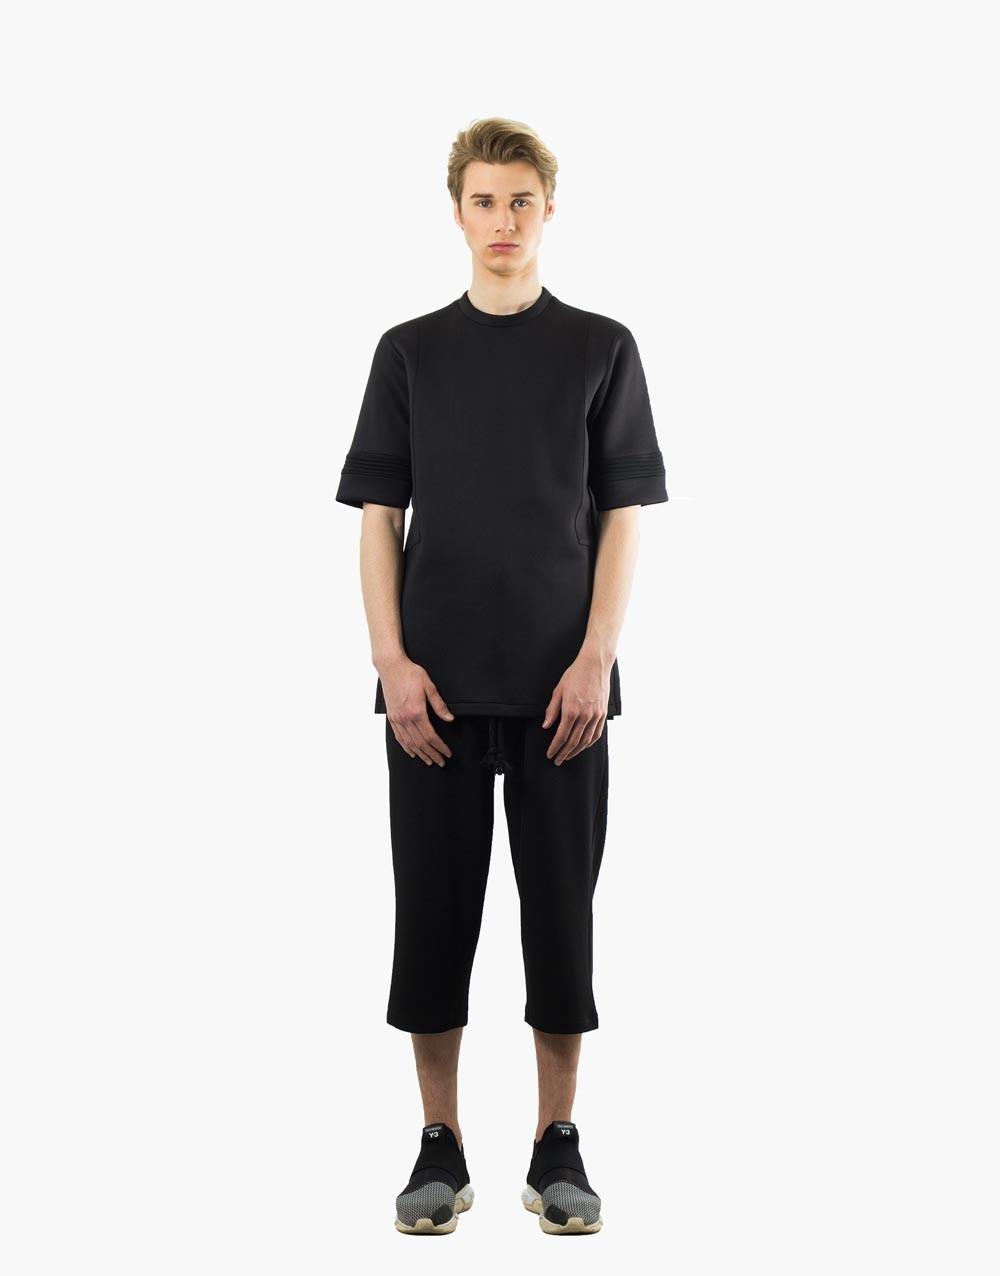 KEN t-shirt black front